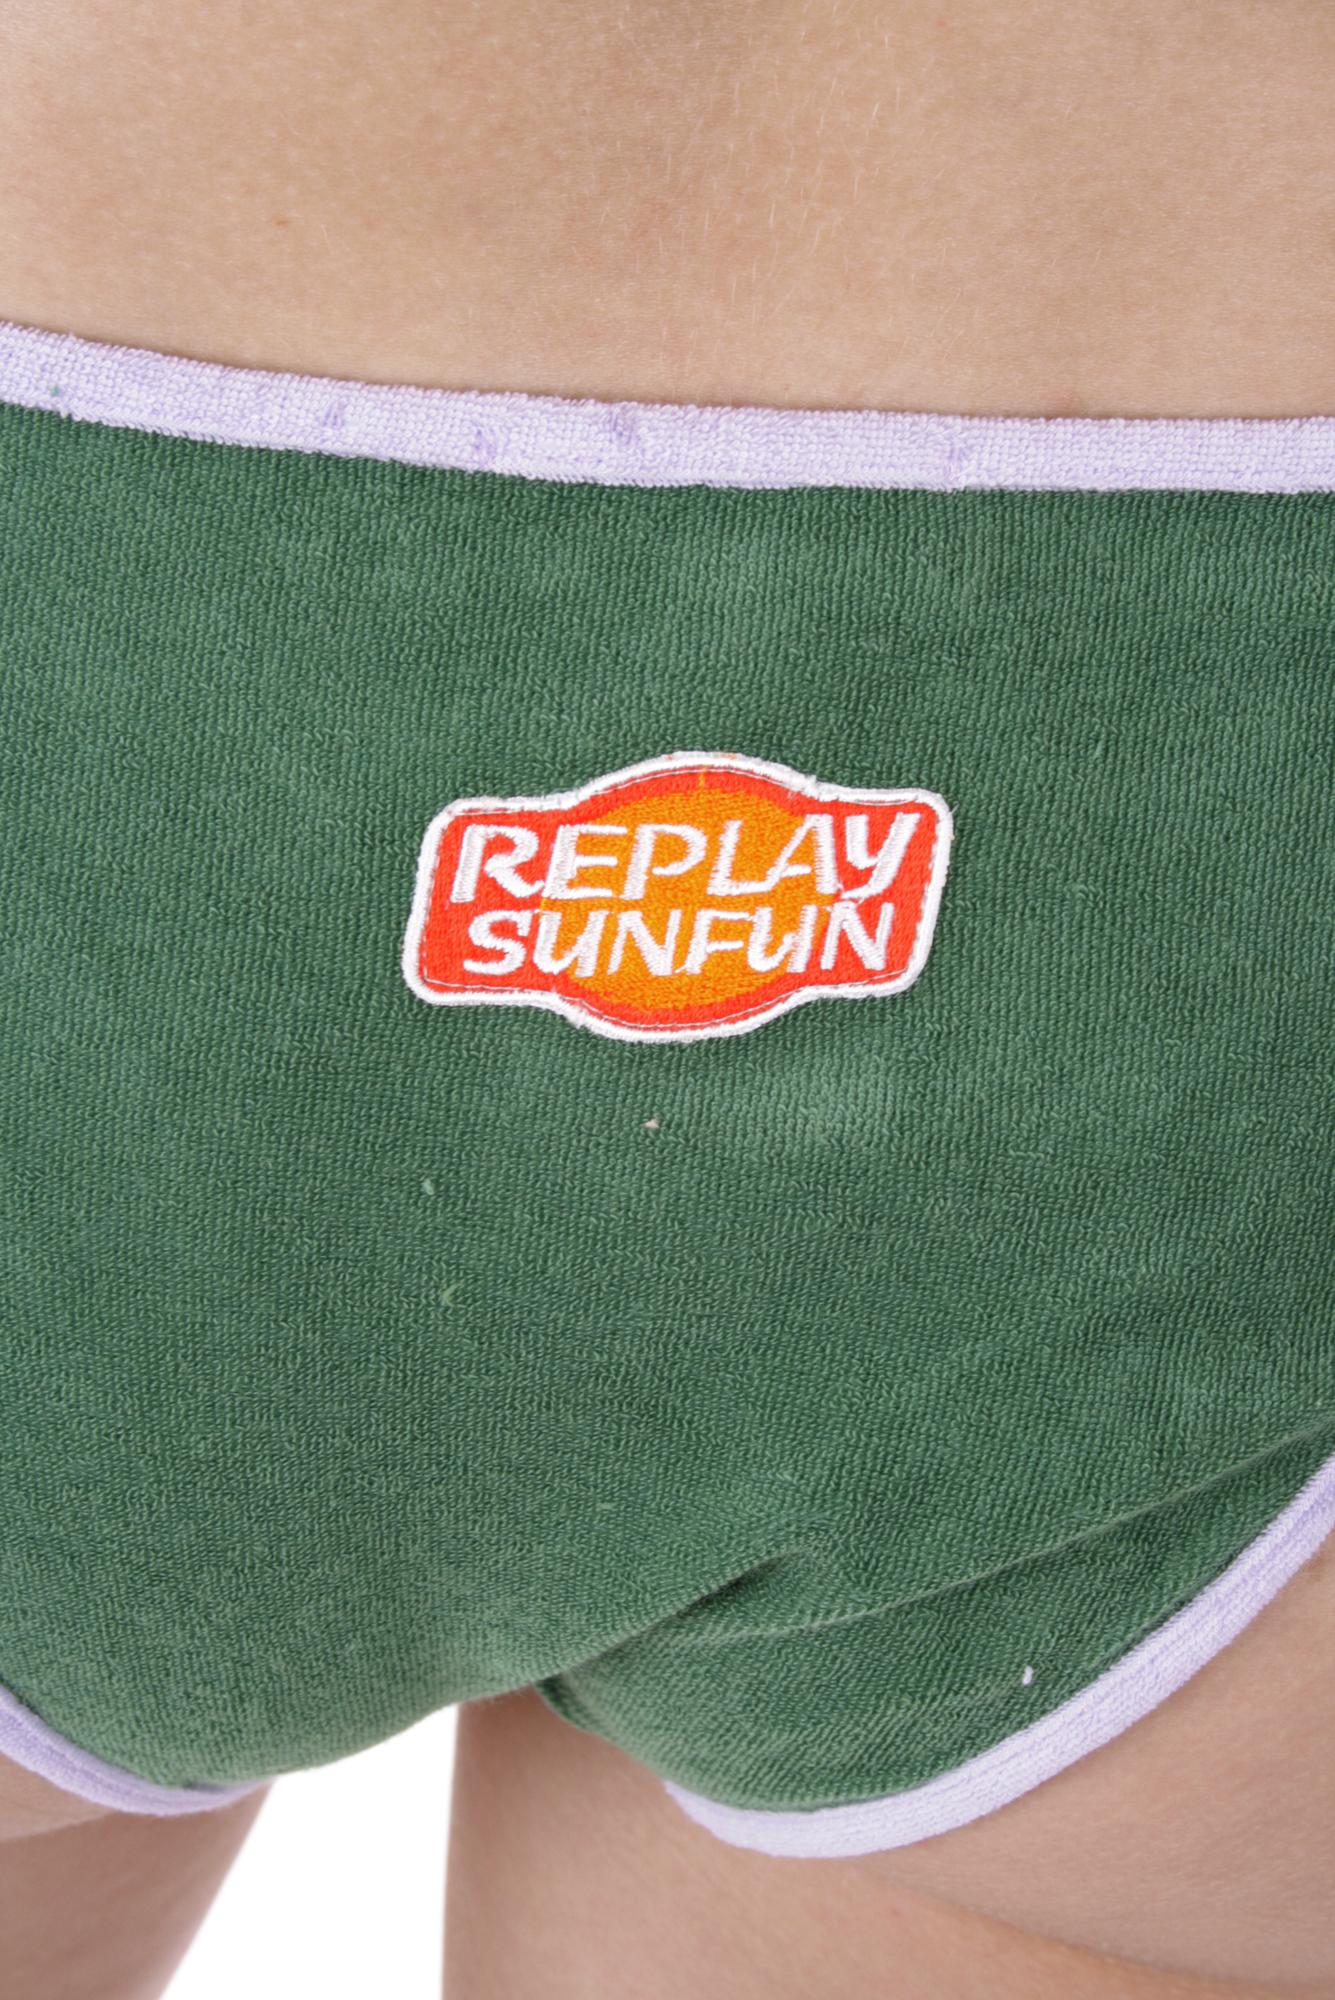 replay bikini badeanzug triangel bh slip gr 36 38 cup a b 60 ebay. Black Bedroom Furniture Sets. Home Design Ideas